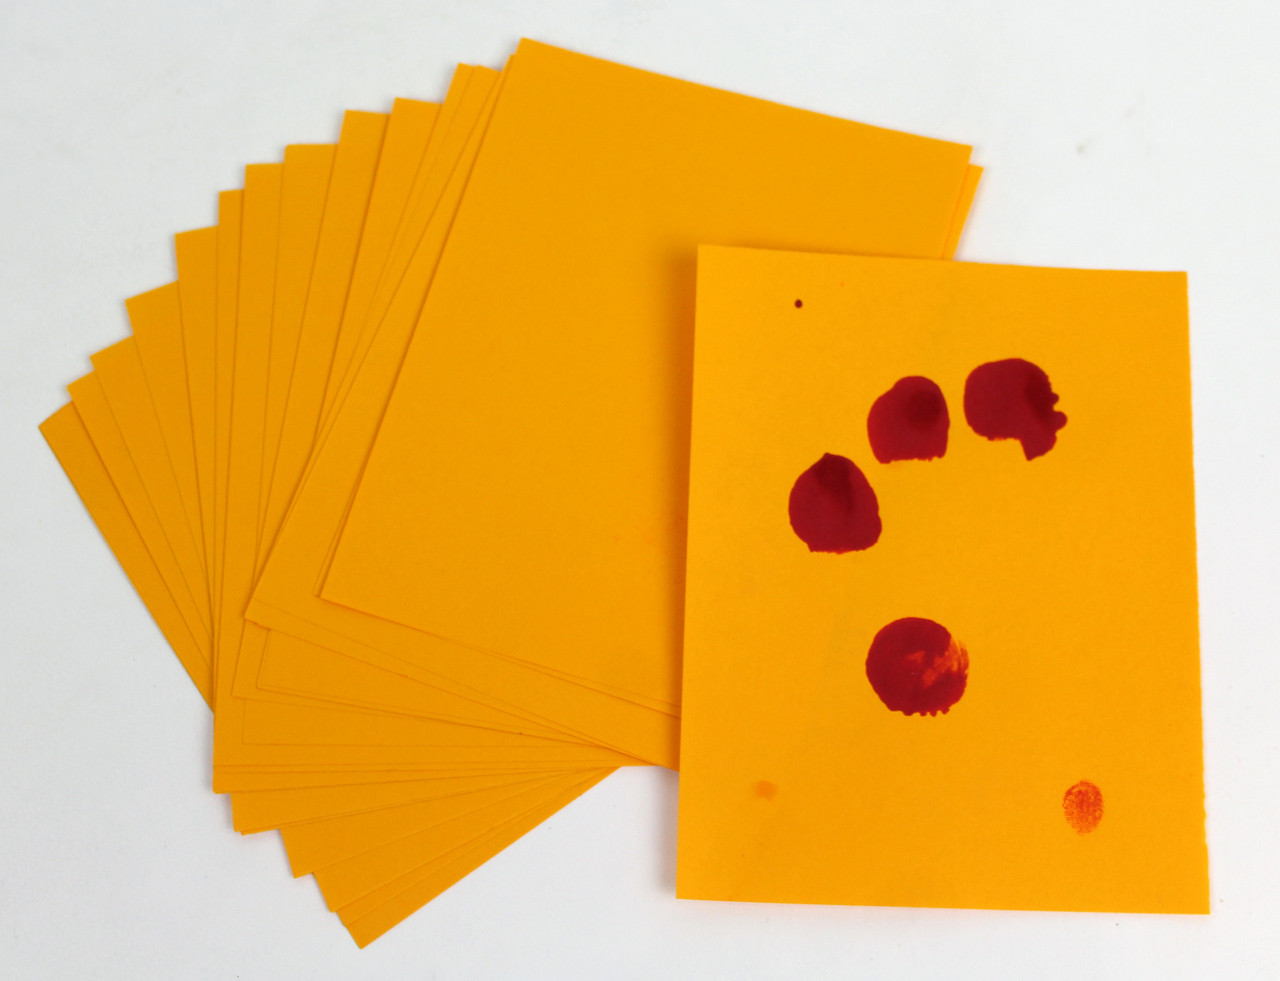 100 Pack of Goldenrod Paper